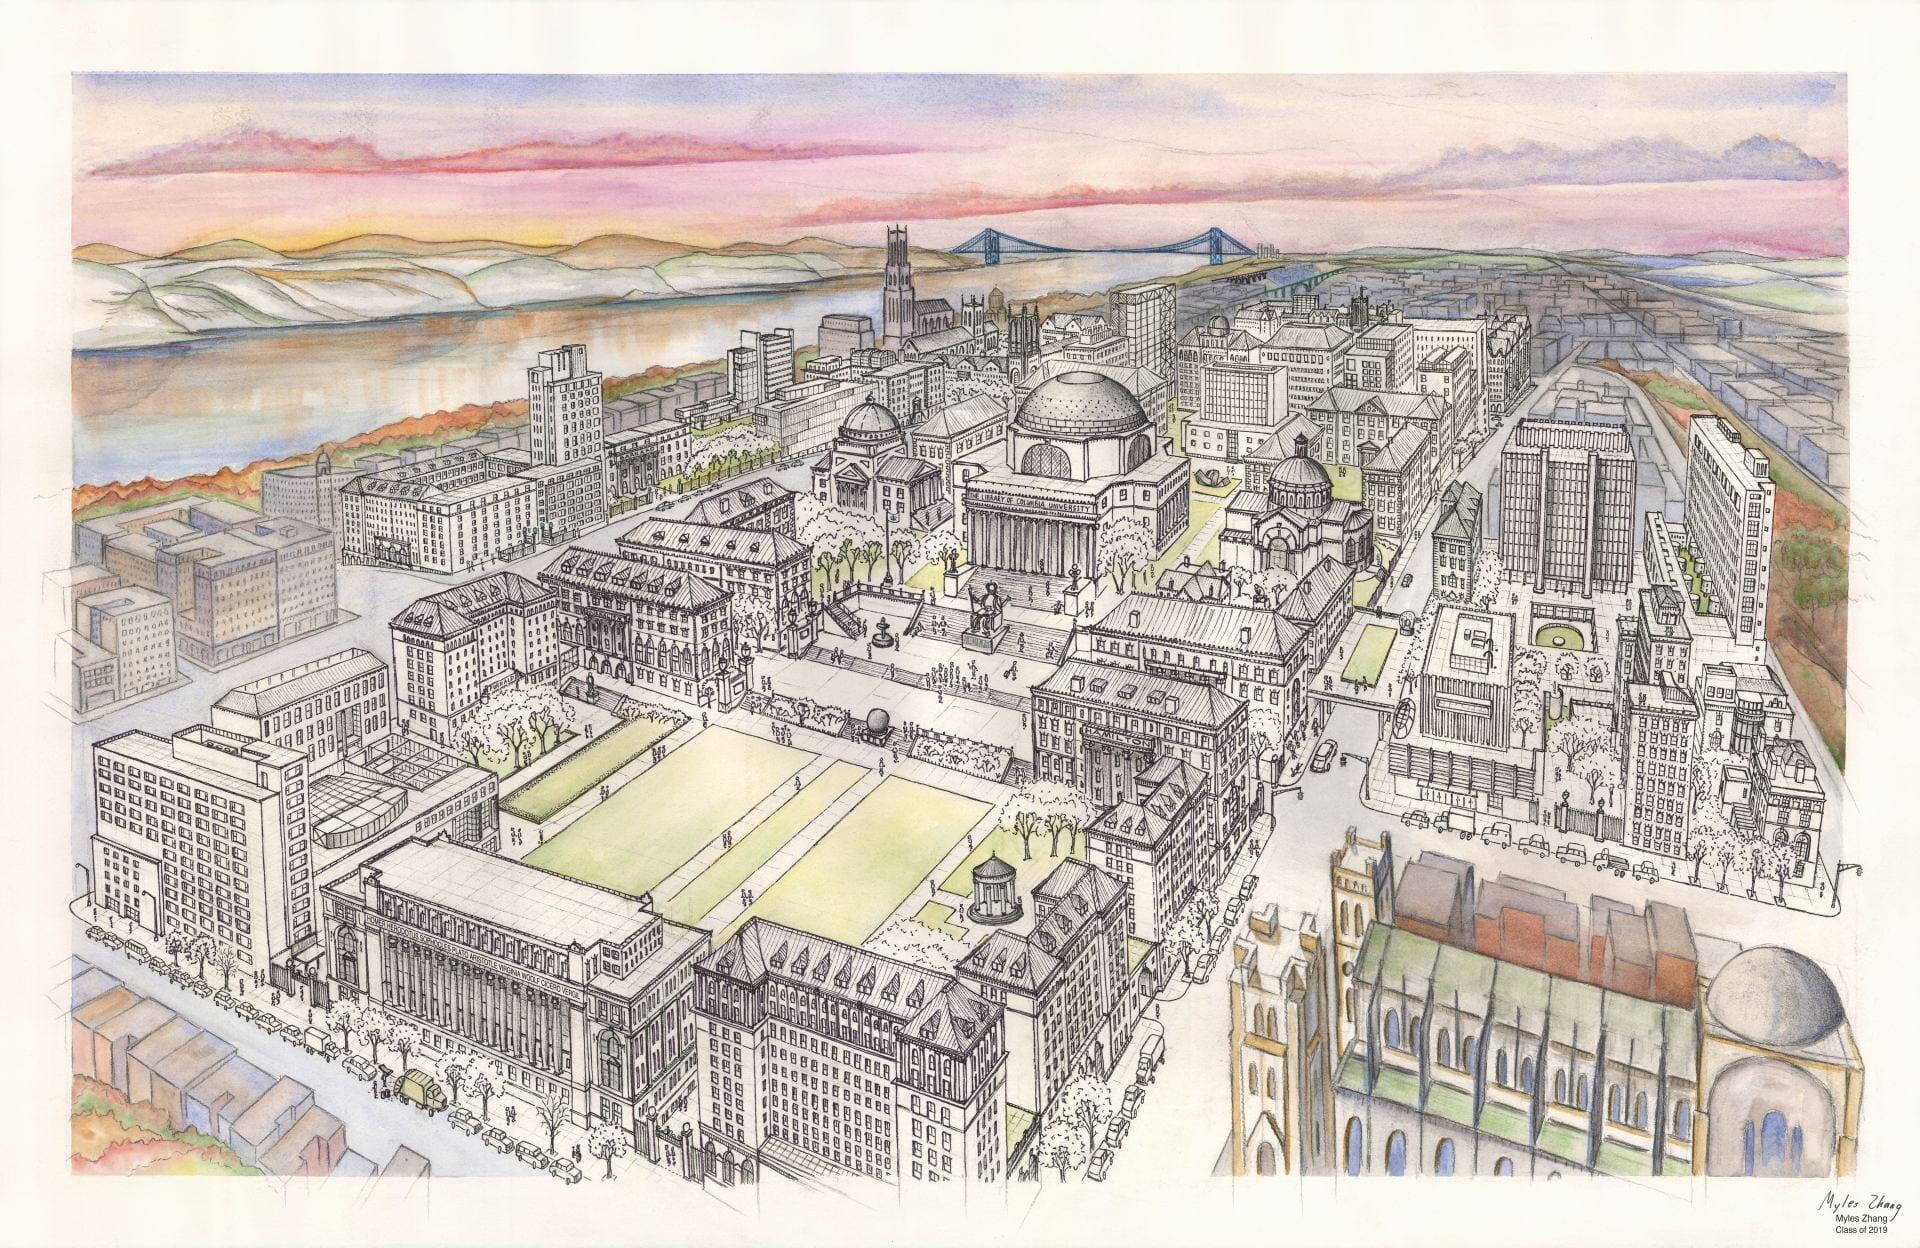 Columbia-University-Drawing-by-Myles-Zhang-13rg9gw-pizfpy.jpg